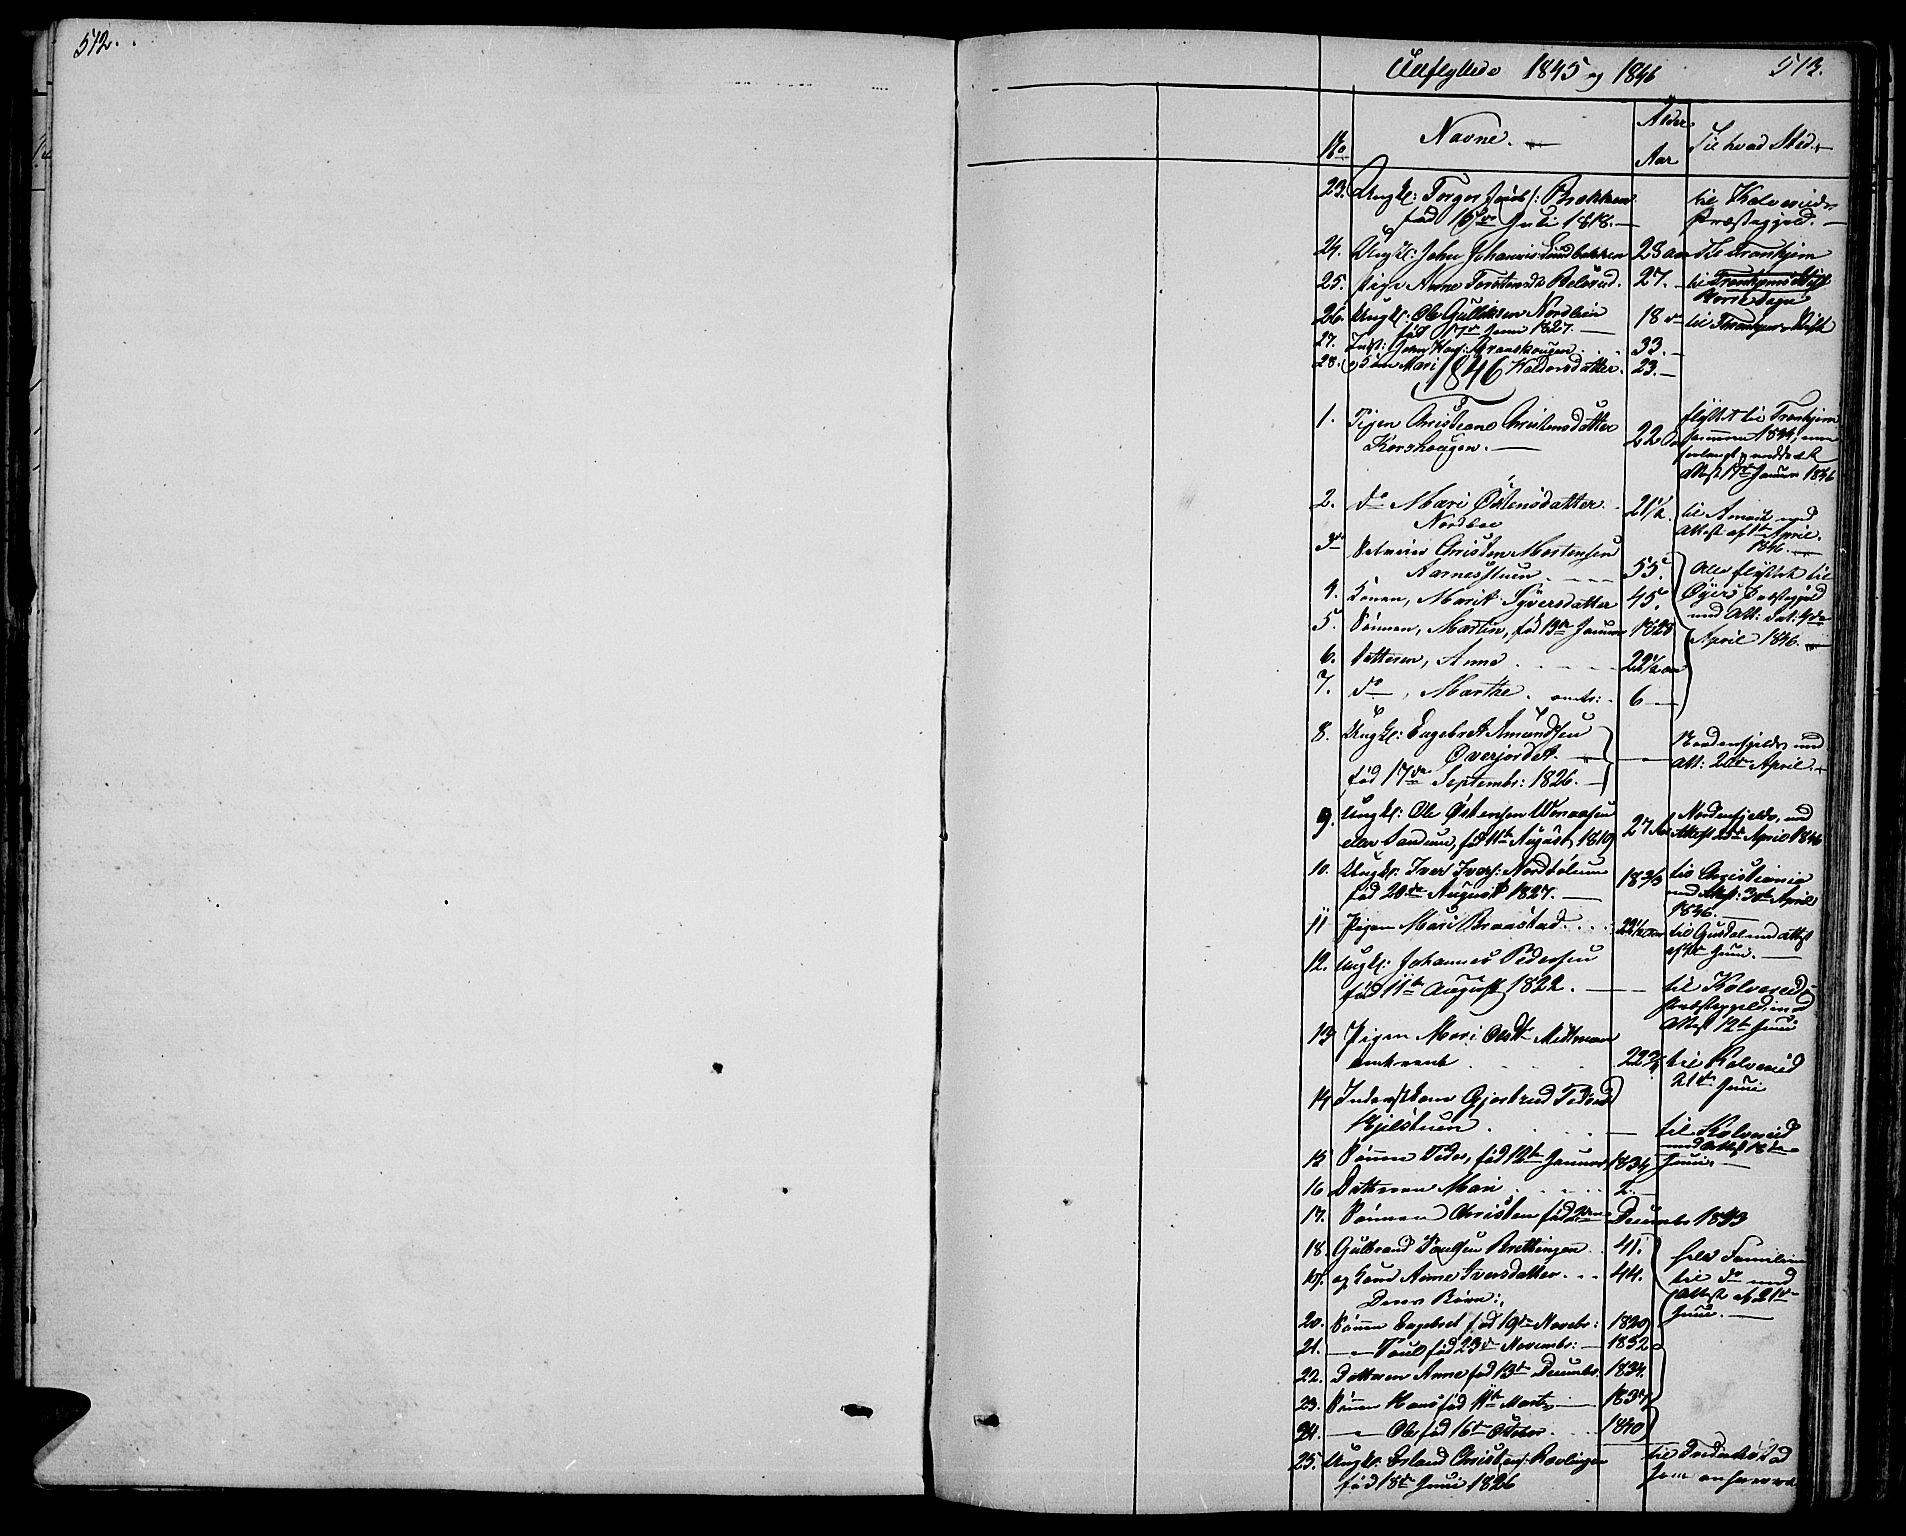 SAH, Ringebu prestekontor, Klokkerbok nr. 2, 1839-1853, s. 512-513